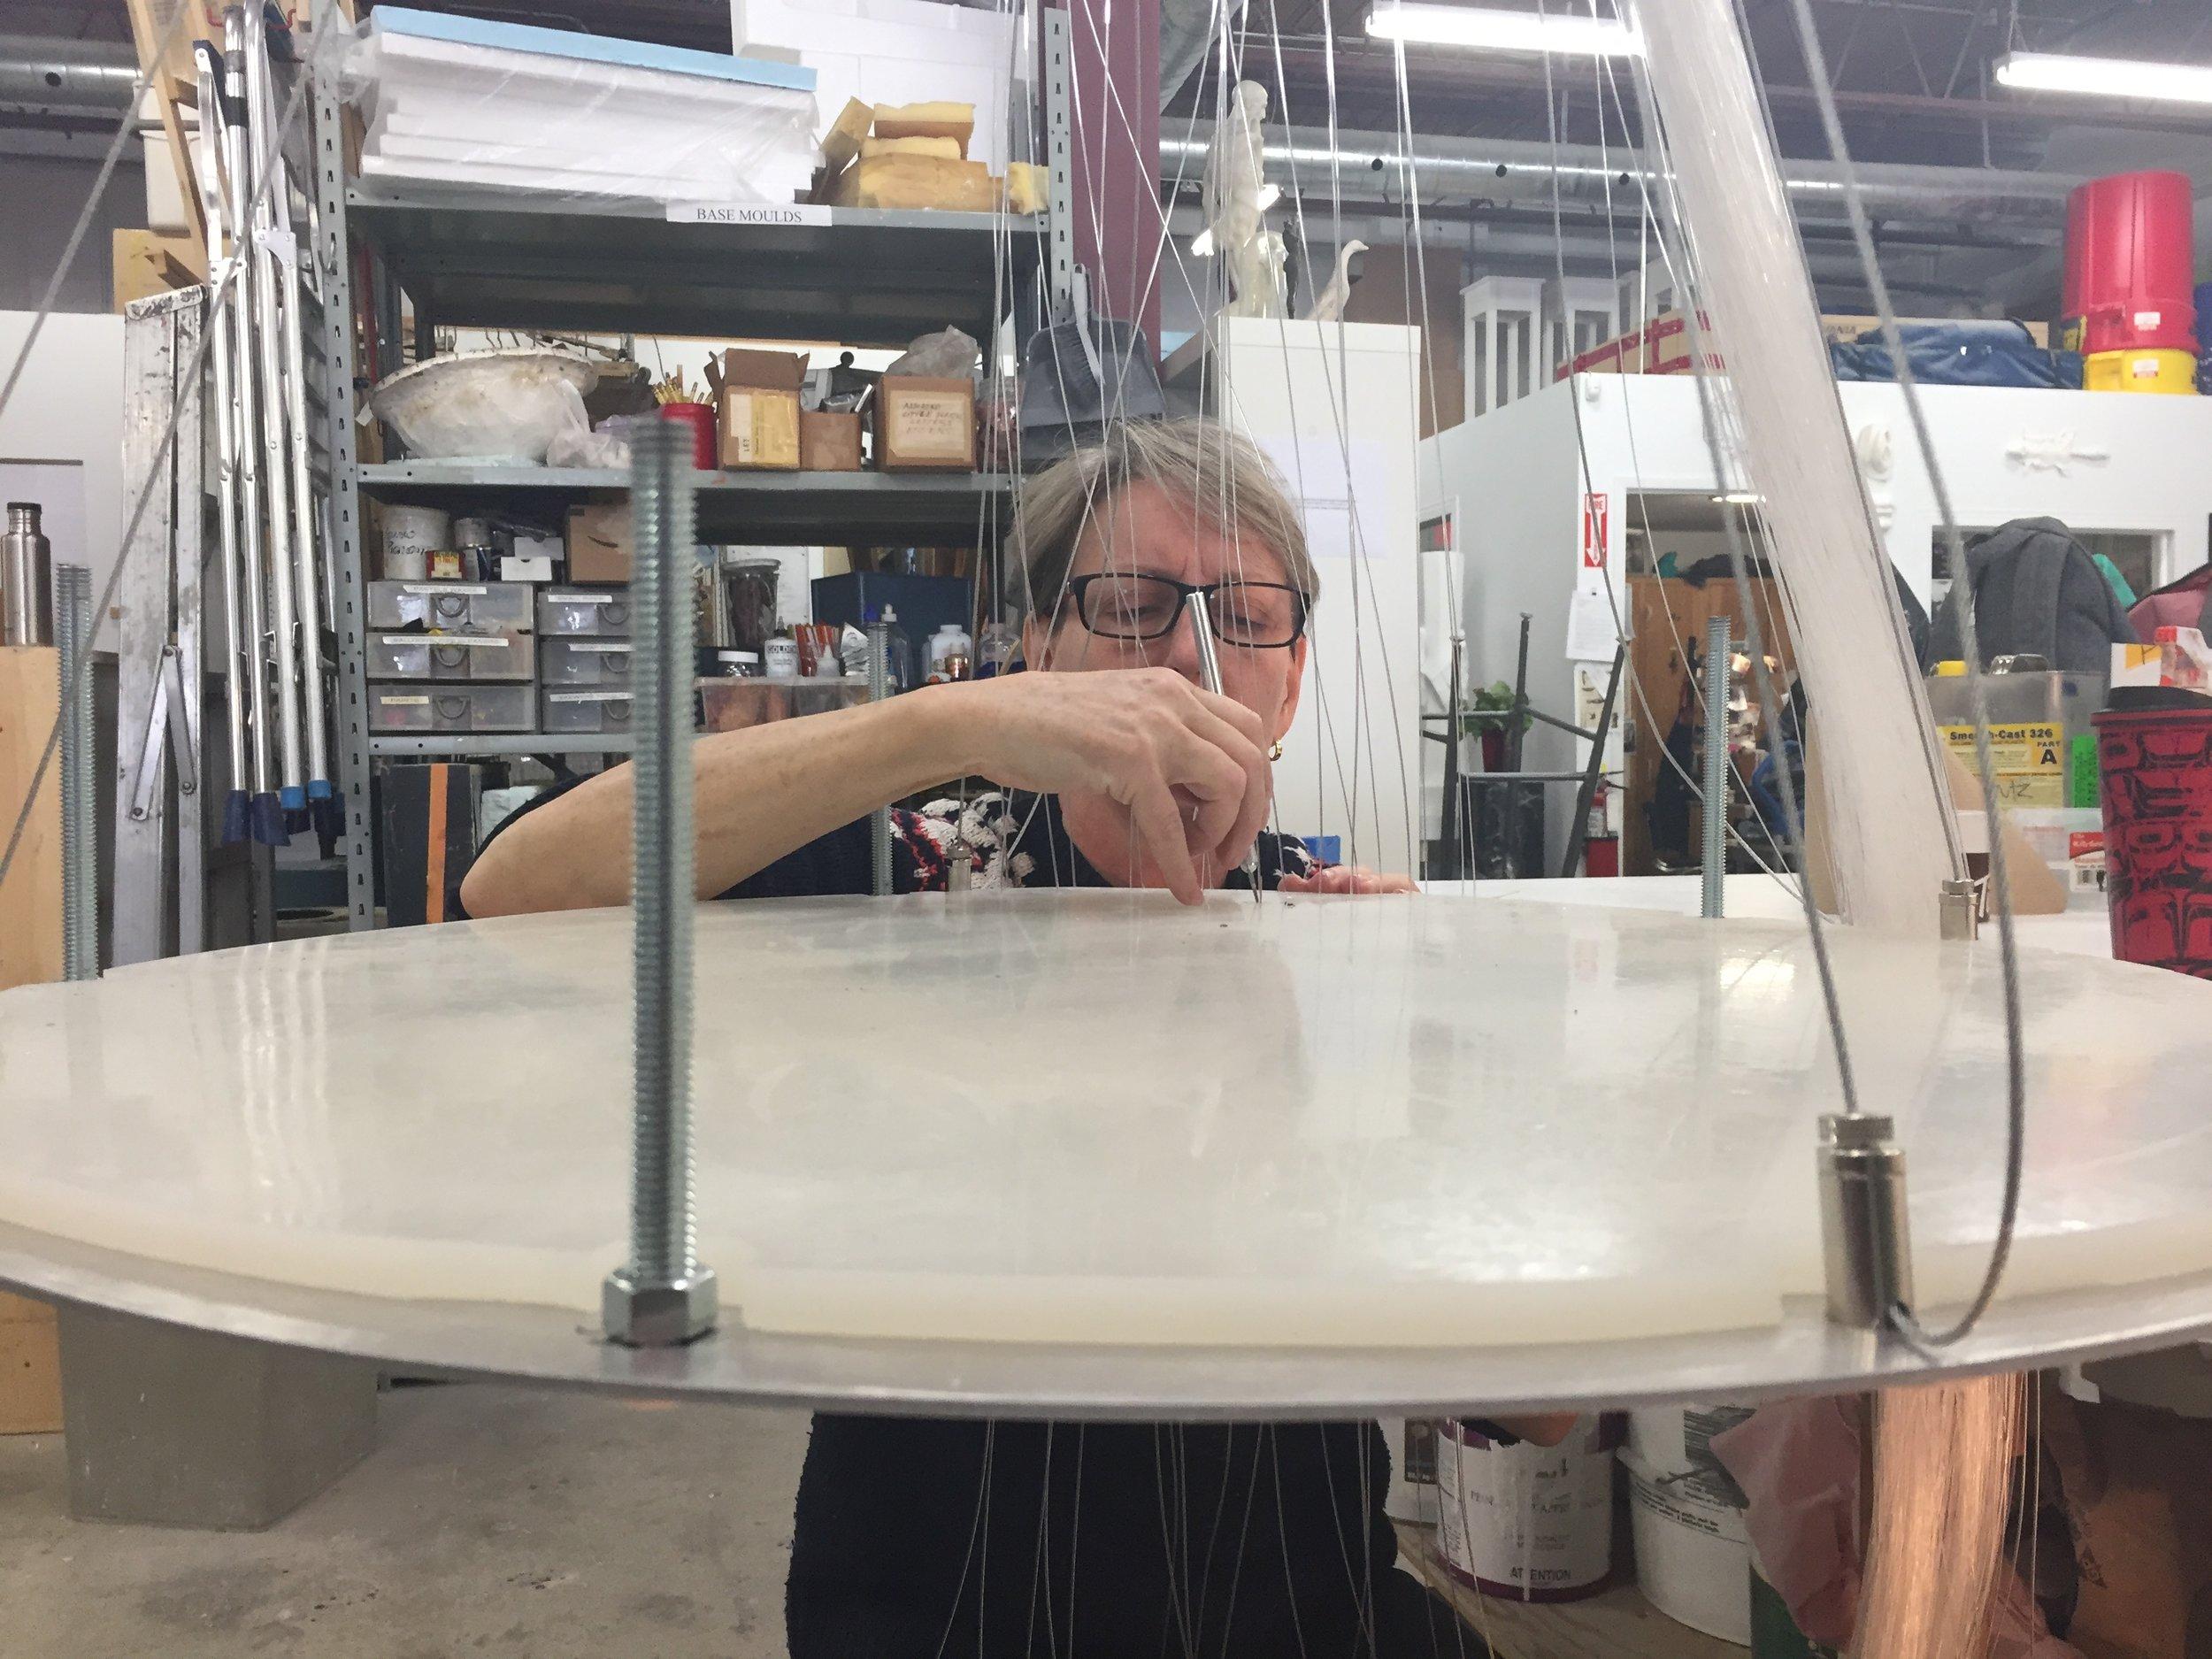 Stringing fiber optics